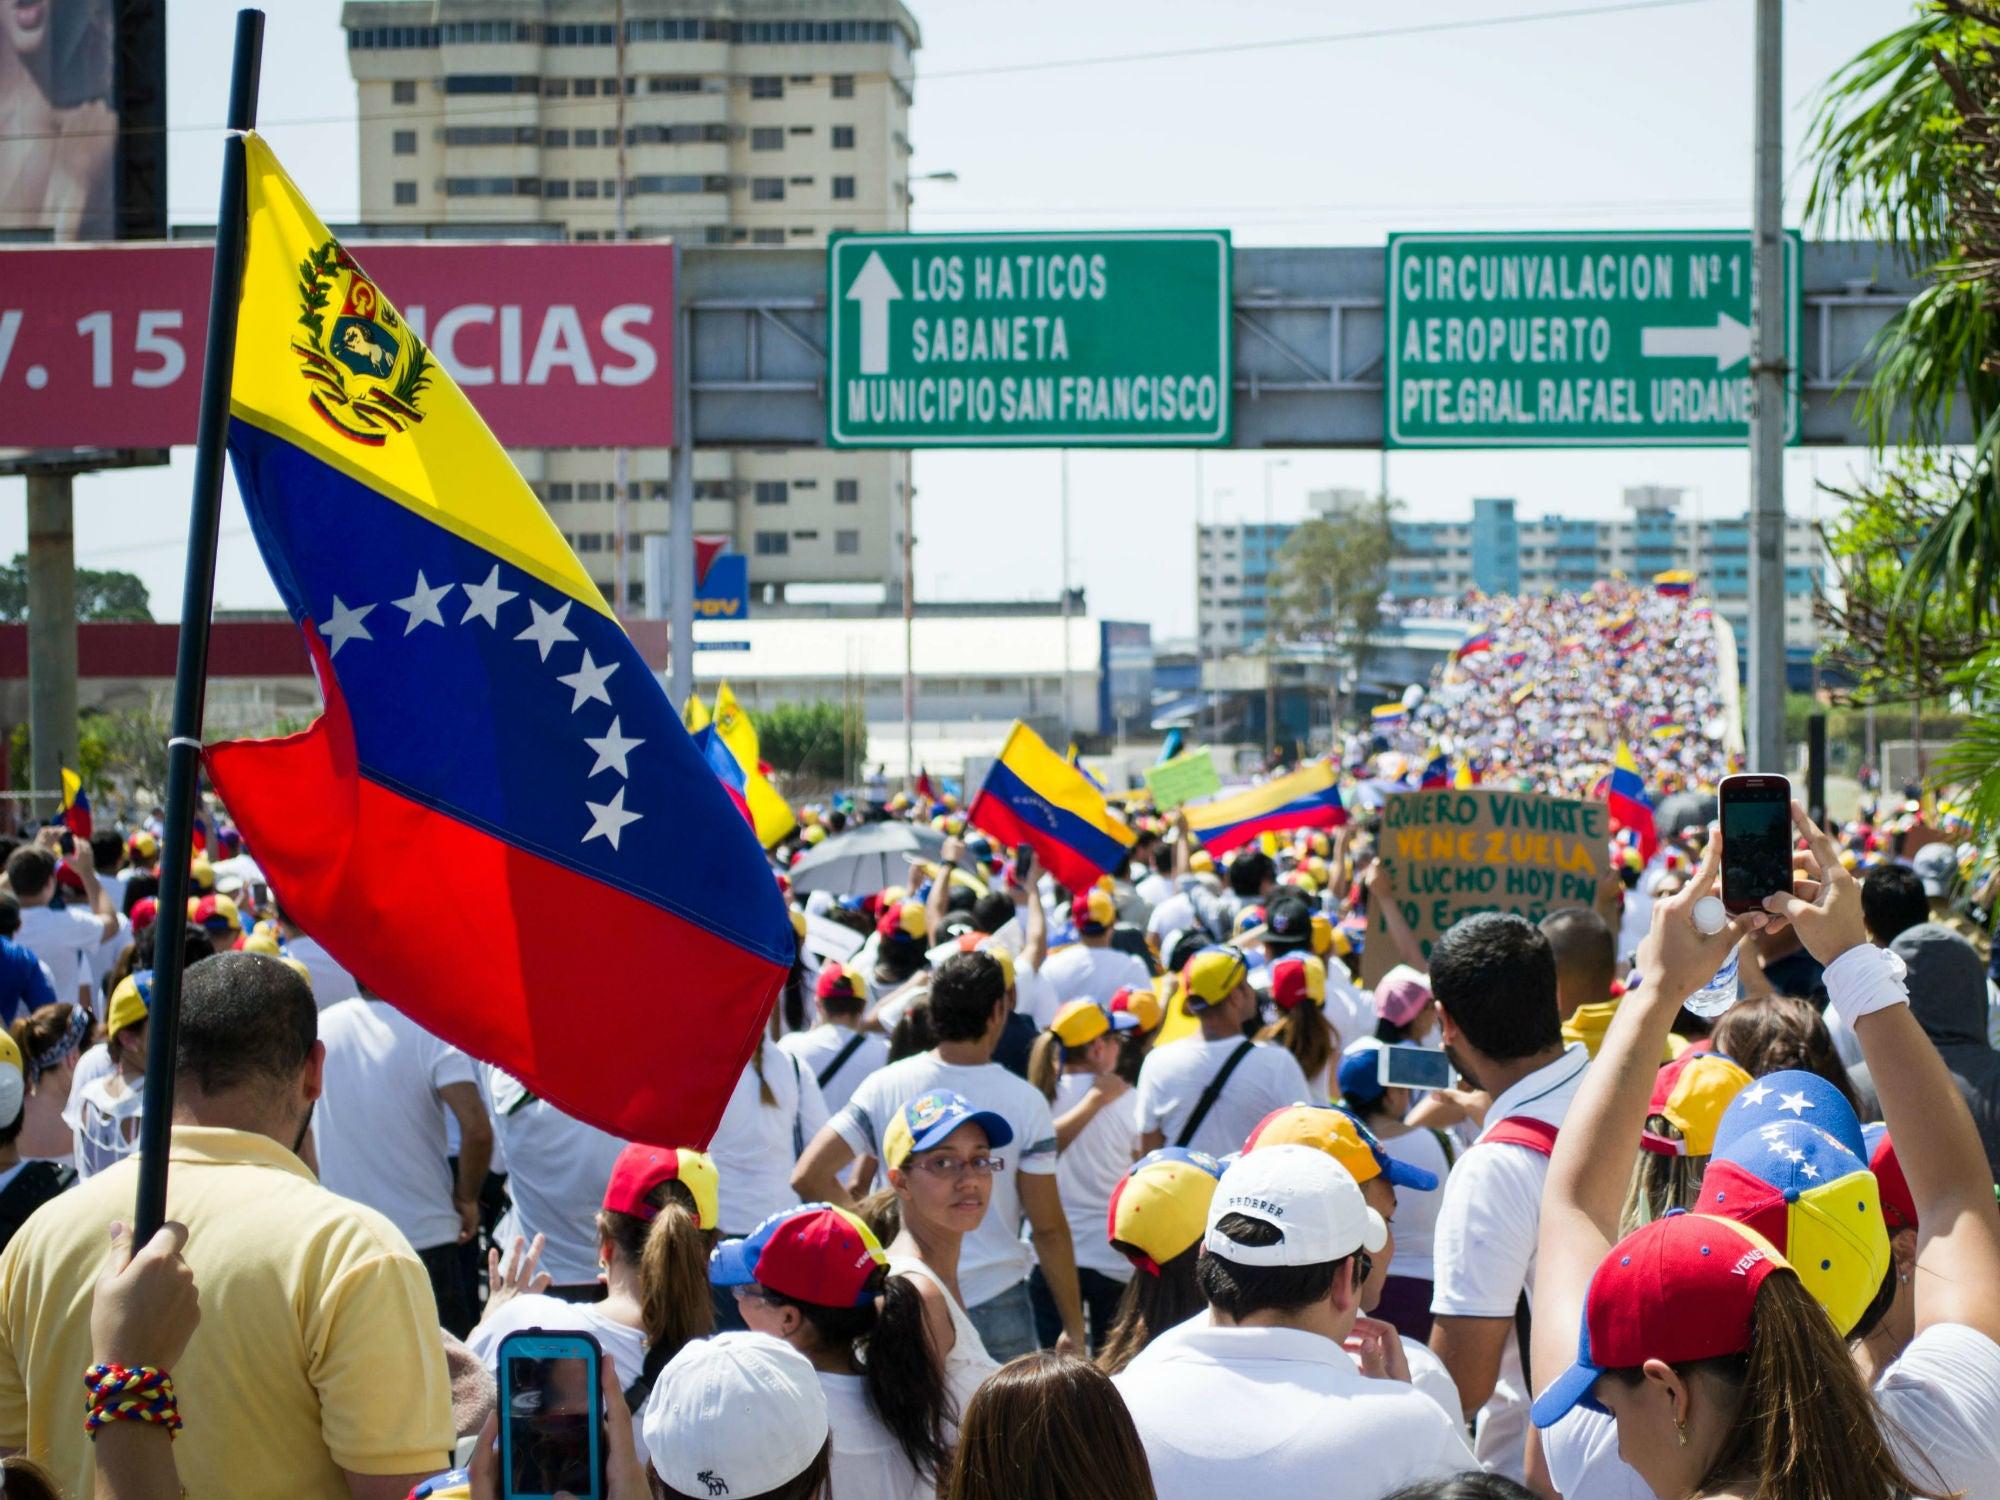 Venezuela's Food Shortage Has Gotten so Severe That Airlines Are Canceling Flights